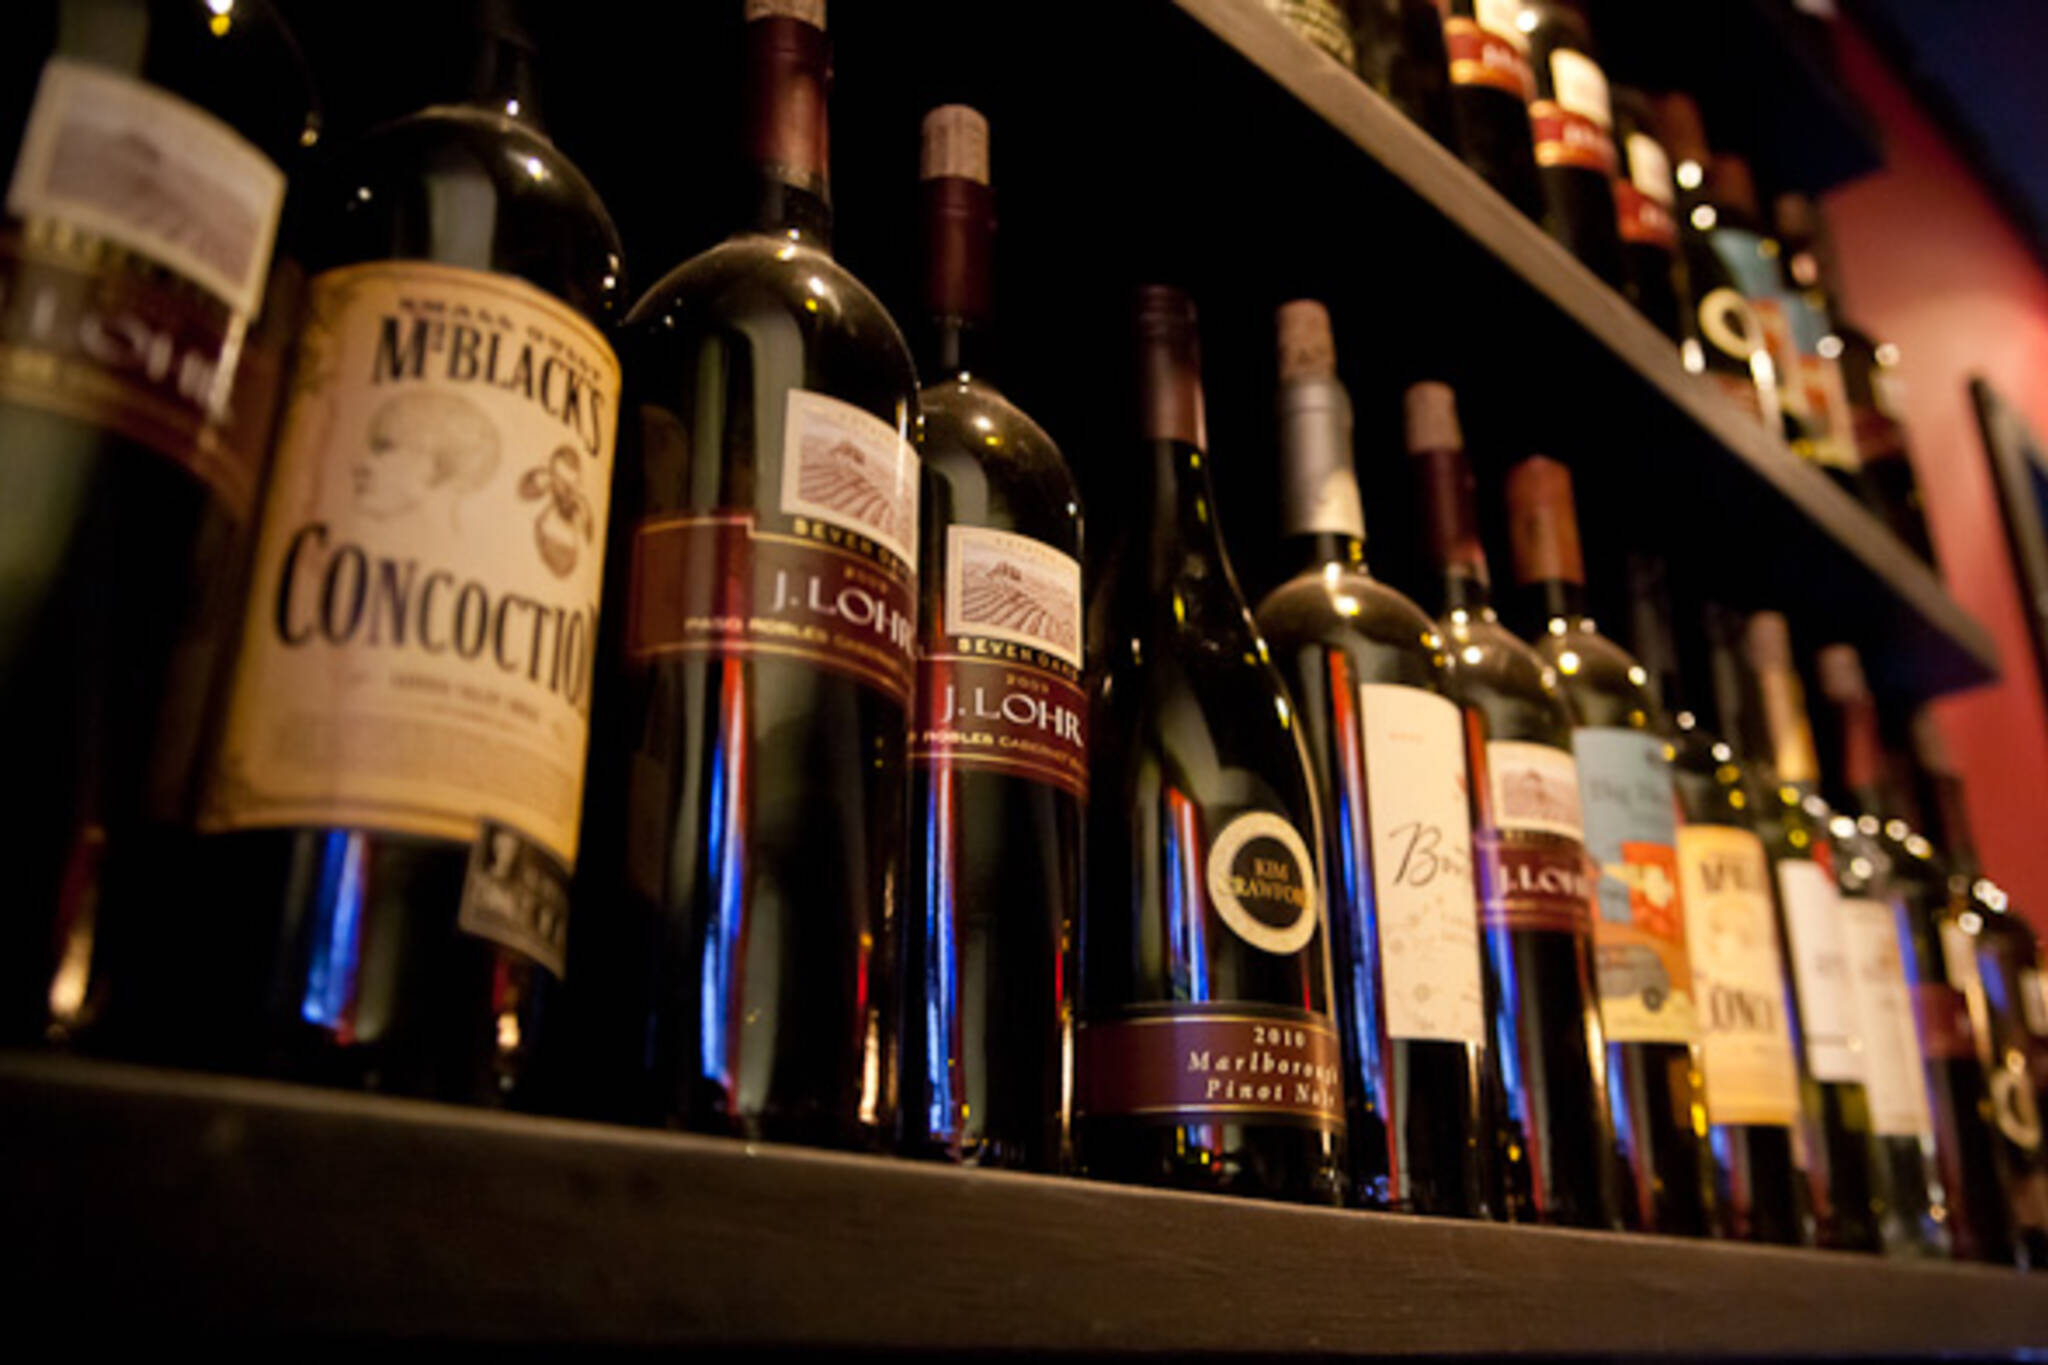 Bathurst Wine Bar